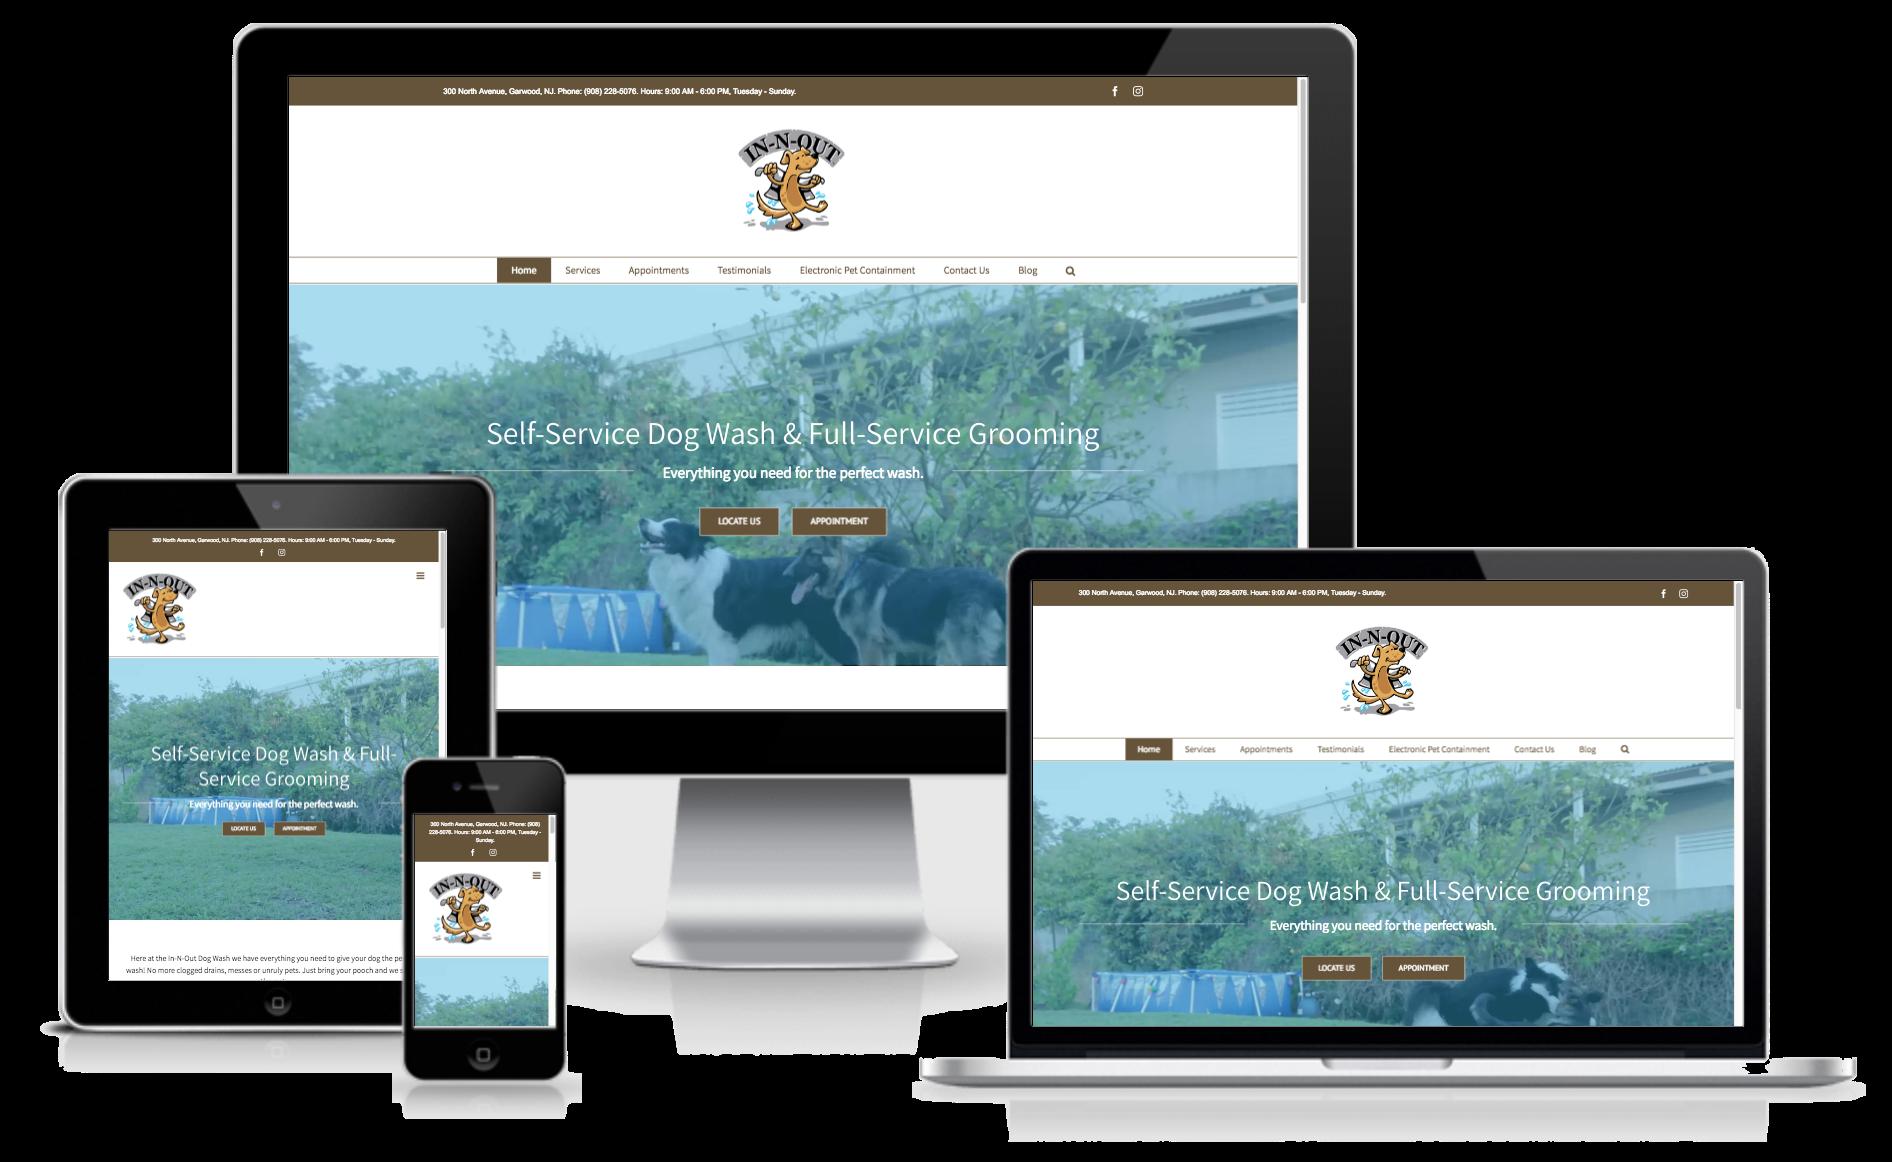 Small business website designwordpress examples nj review coming soon solutioingenieria Gallery